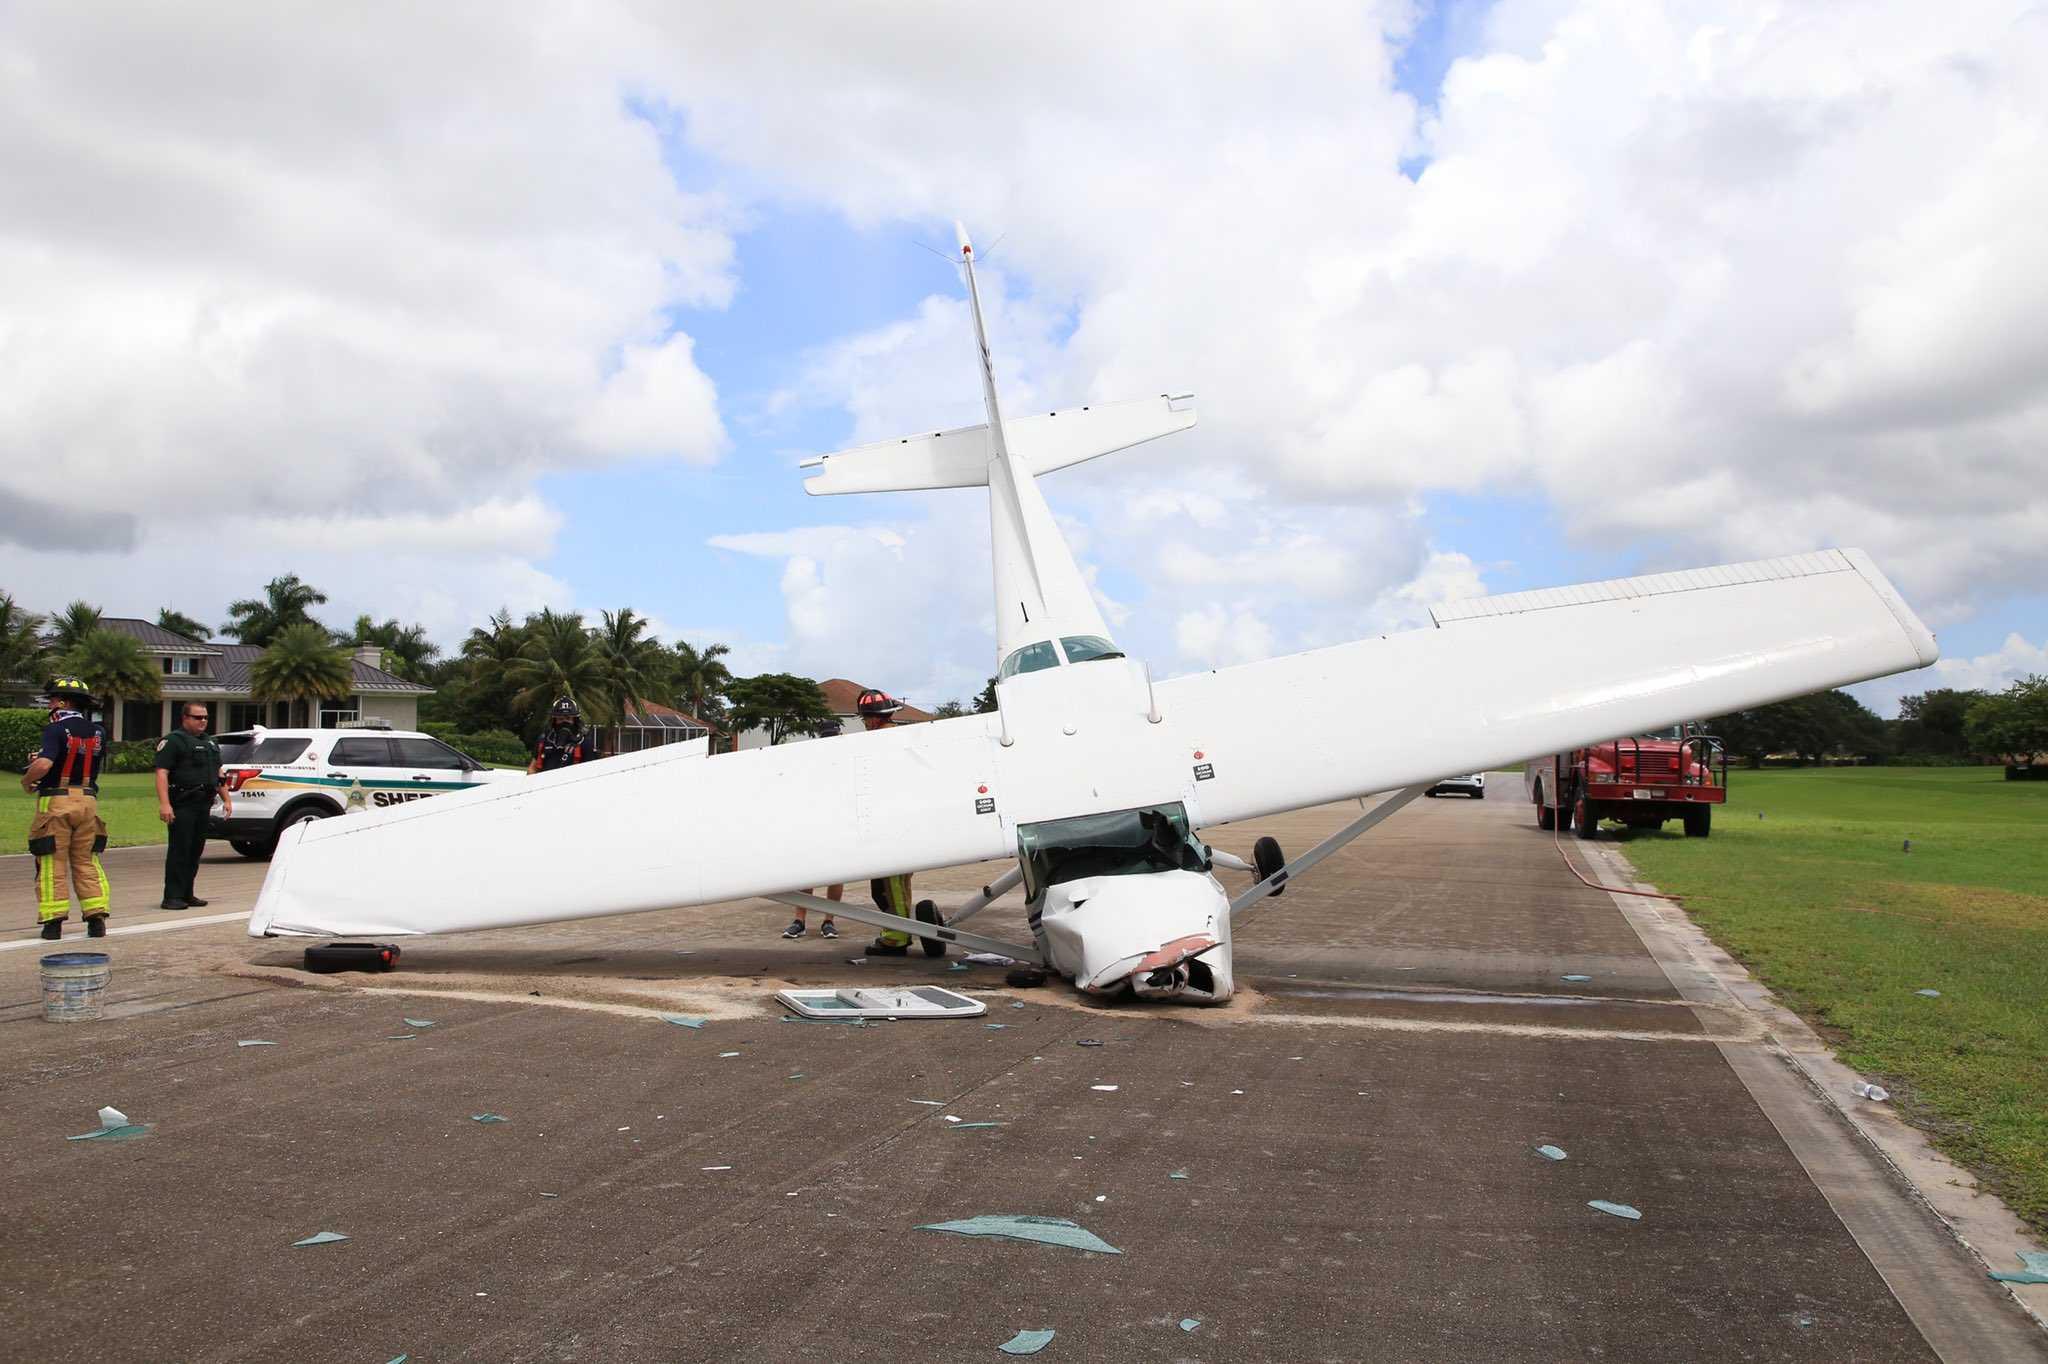 Sheriff's office identifies woman injured in small plane crash in Wellington Aero Club